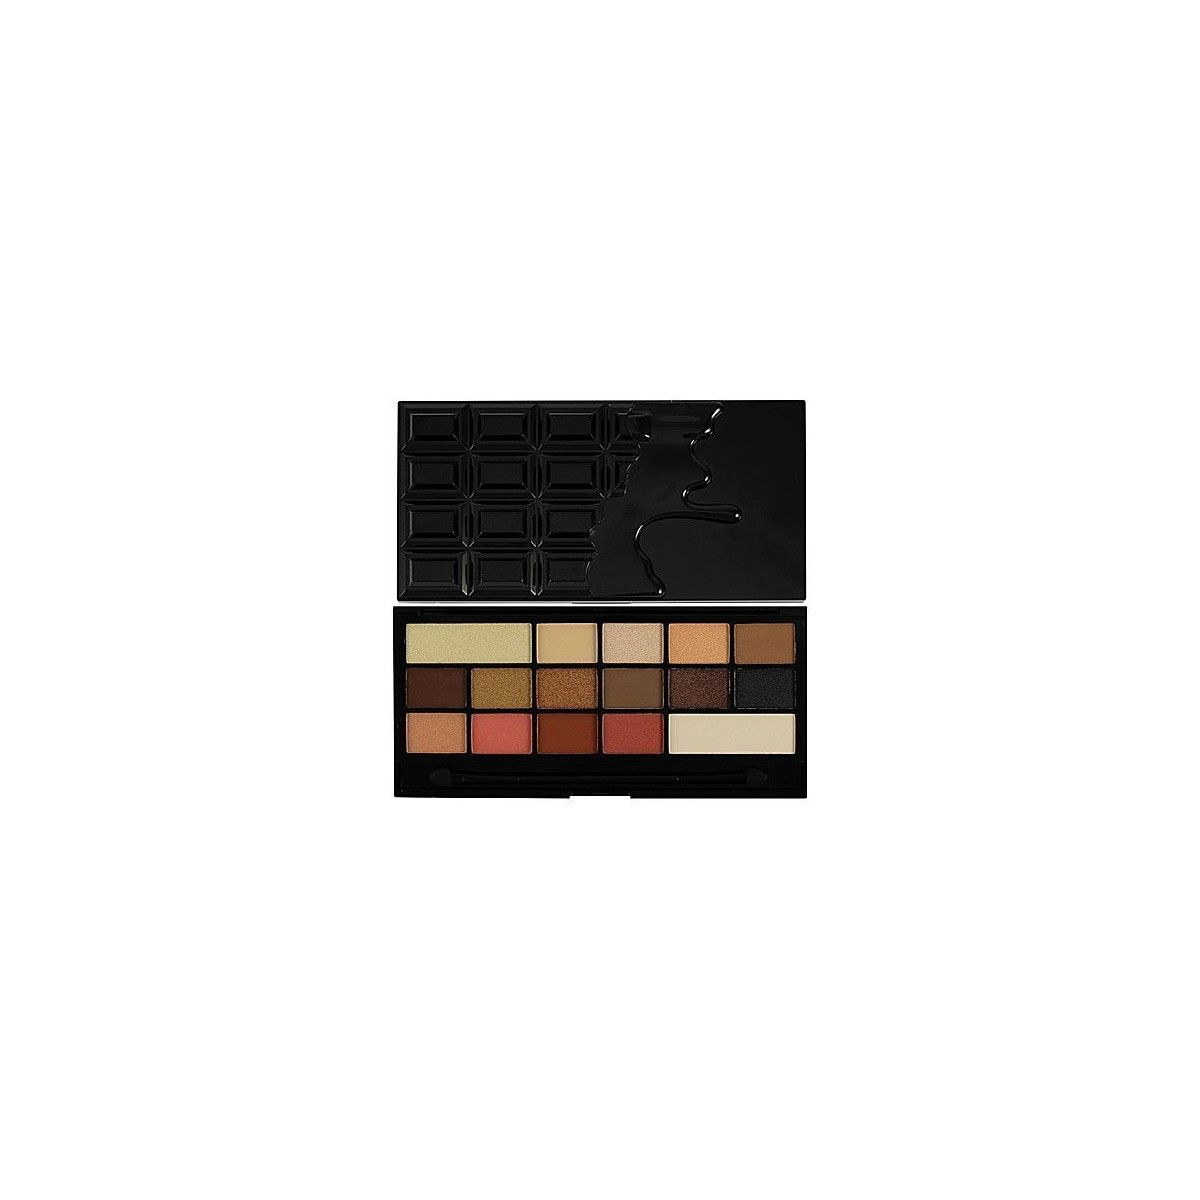 Makeup Revolution 16 Eyeshadows I Love Makeup Chocolate Vice, czekoladowa paleta 22g